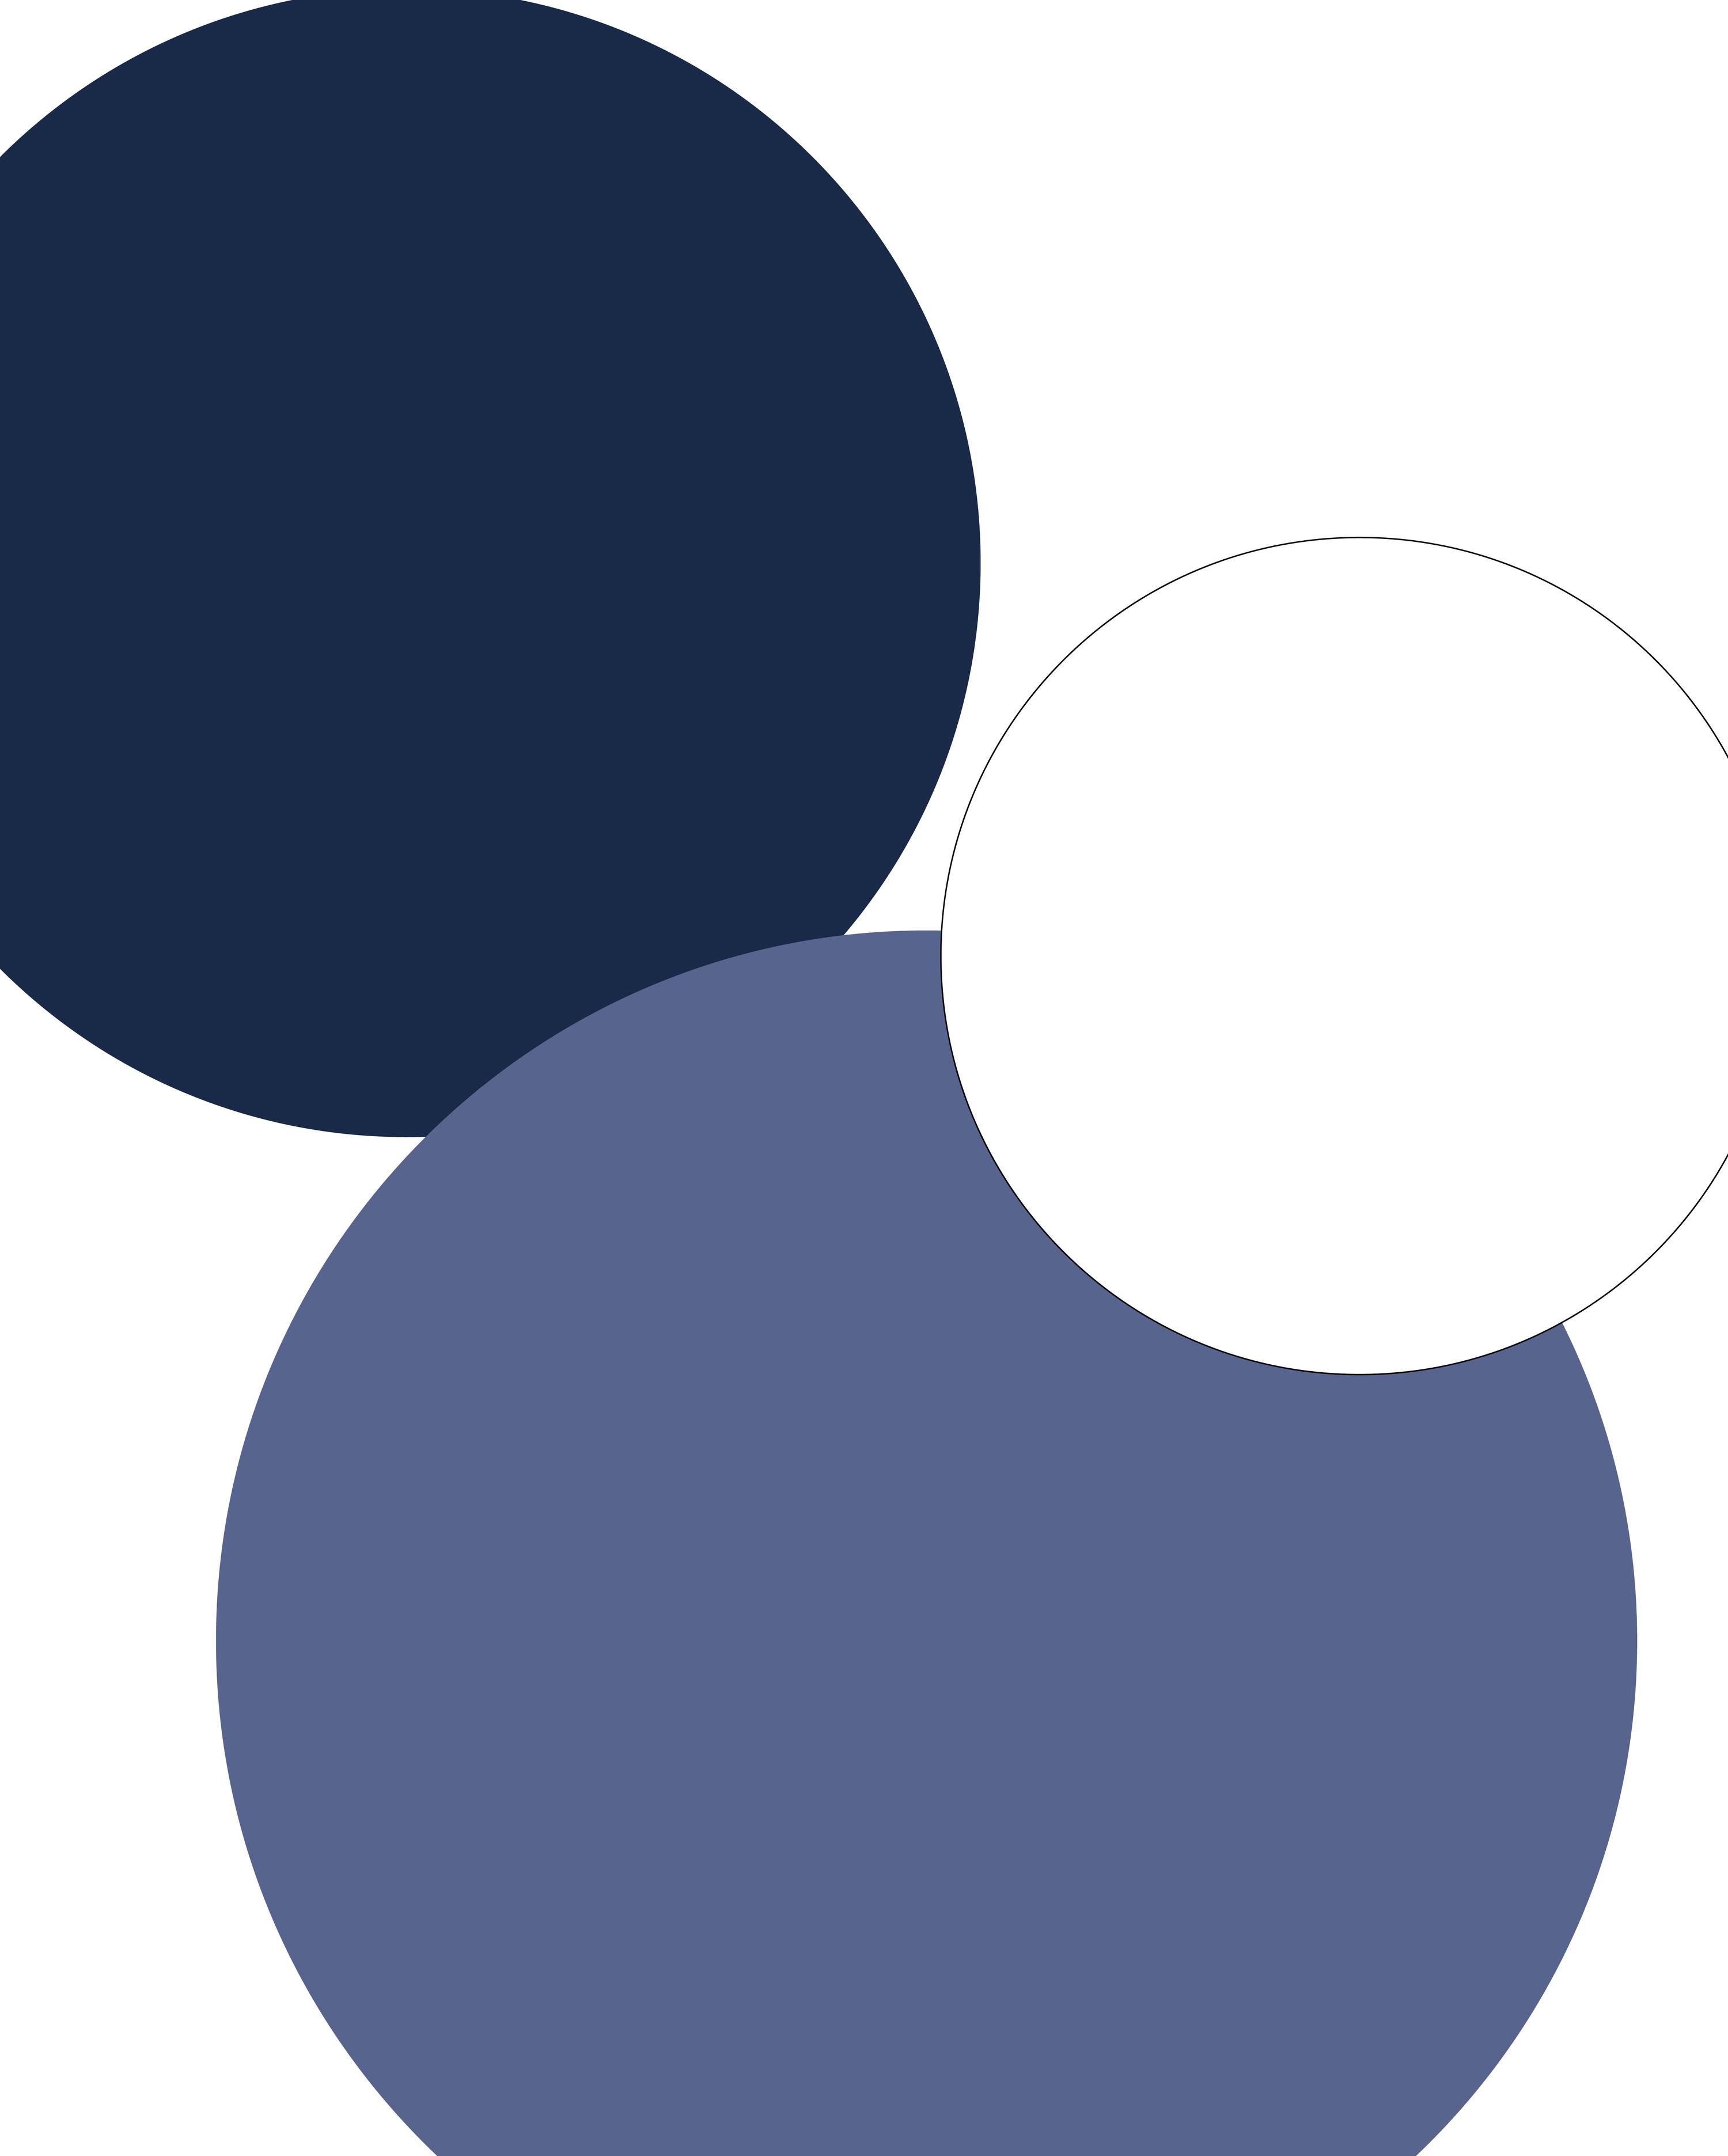 palettestory-gillianwilliam-0715.jpg